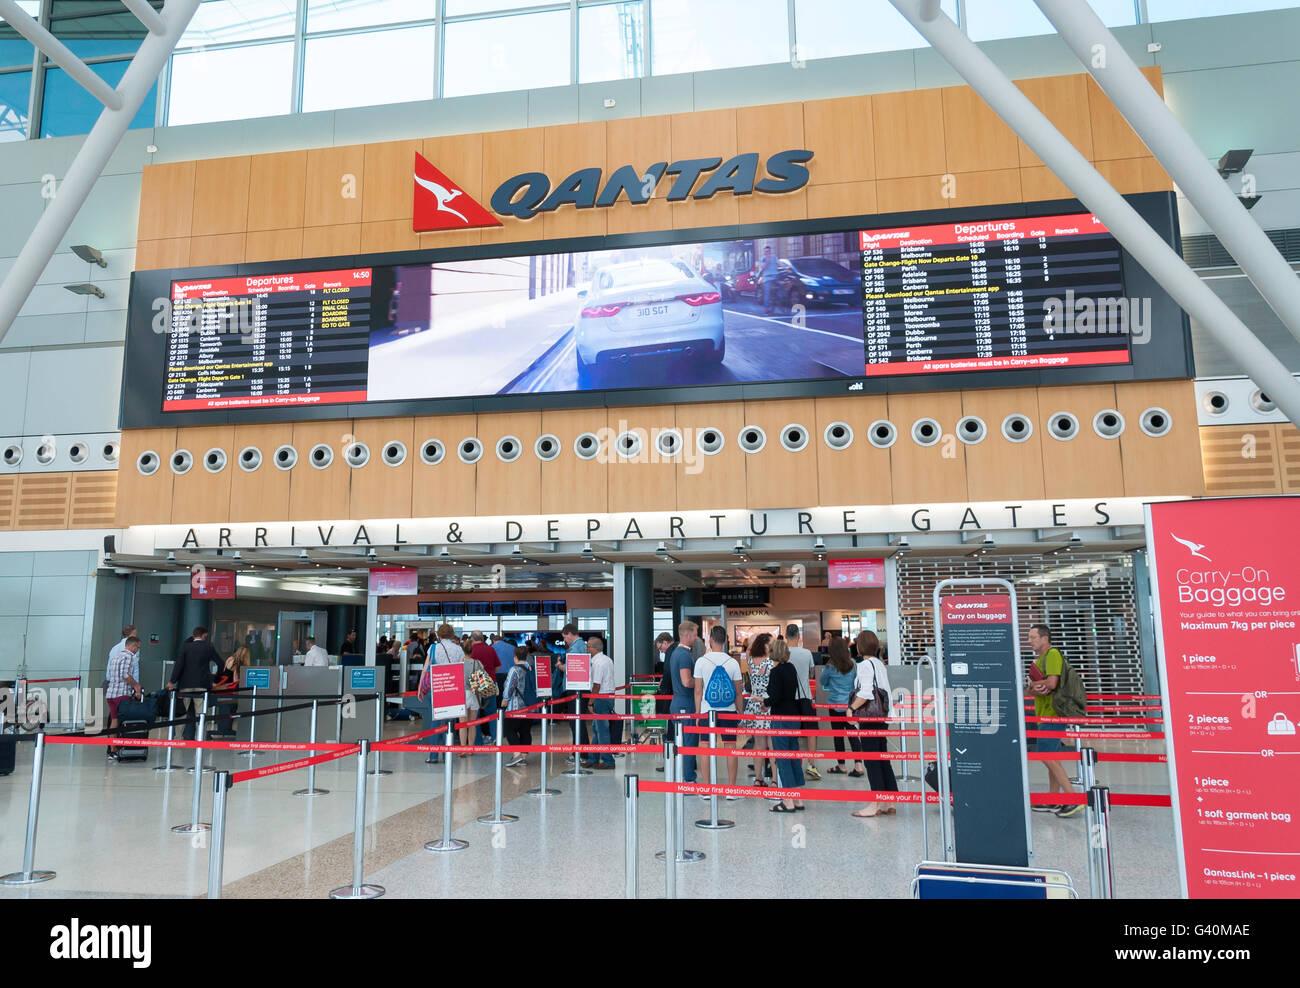 Ankunft & Abflug-Gates auf am Flughafen Sydney Kingsford Smith, Maskottchen, Sydney, New South Wales, Australien Stockbild